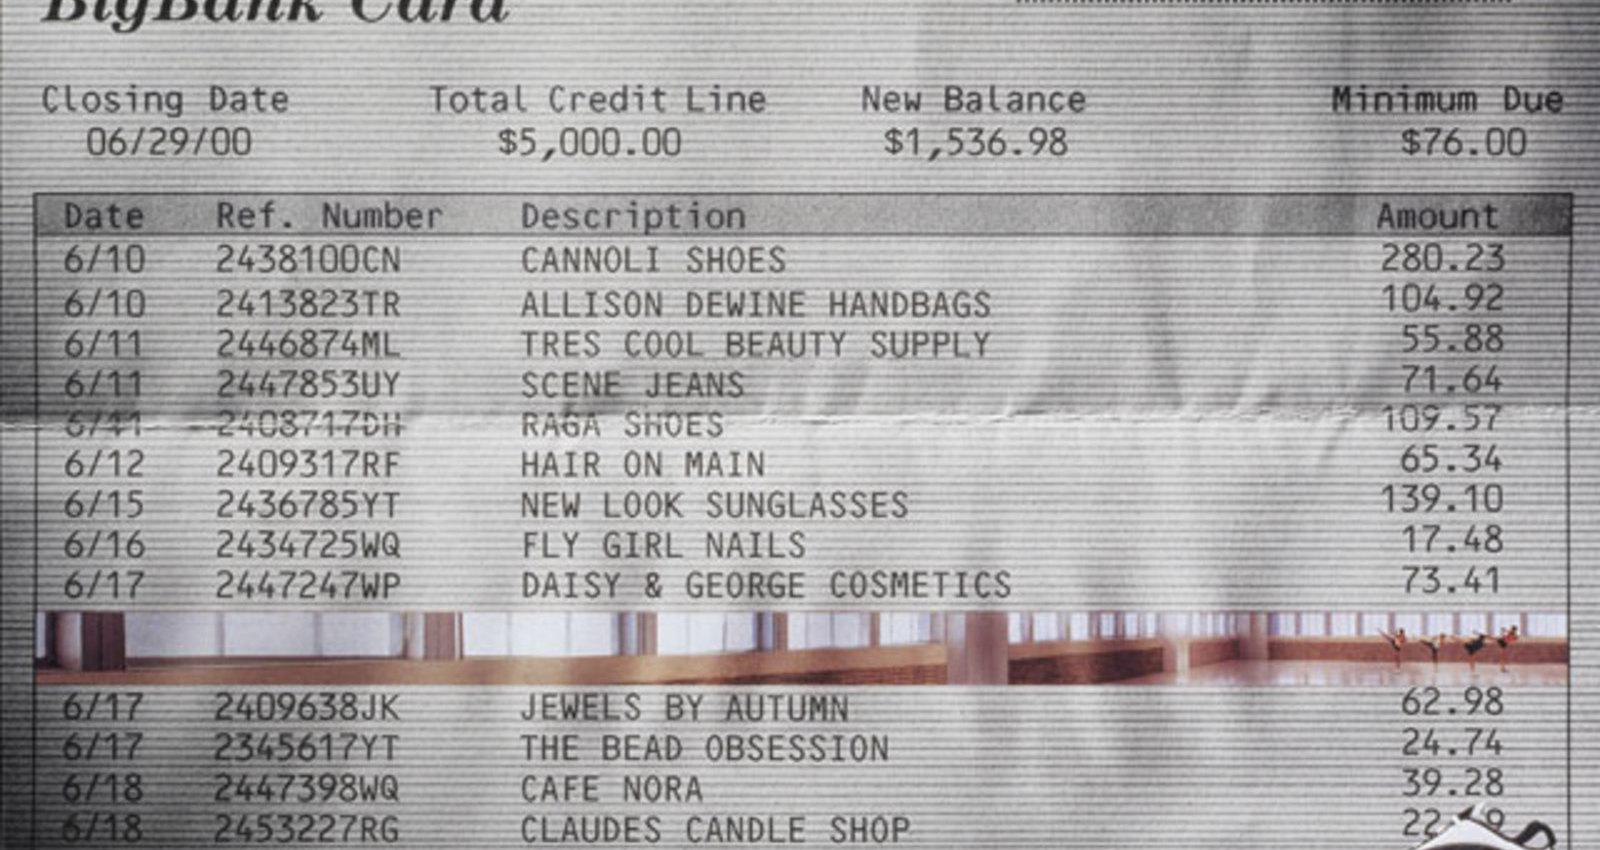 TV Guide, Timesheet, Bar tab, Email, Credit Card Bill